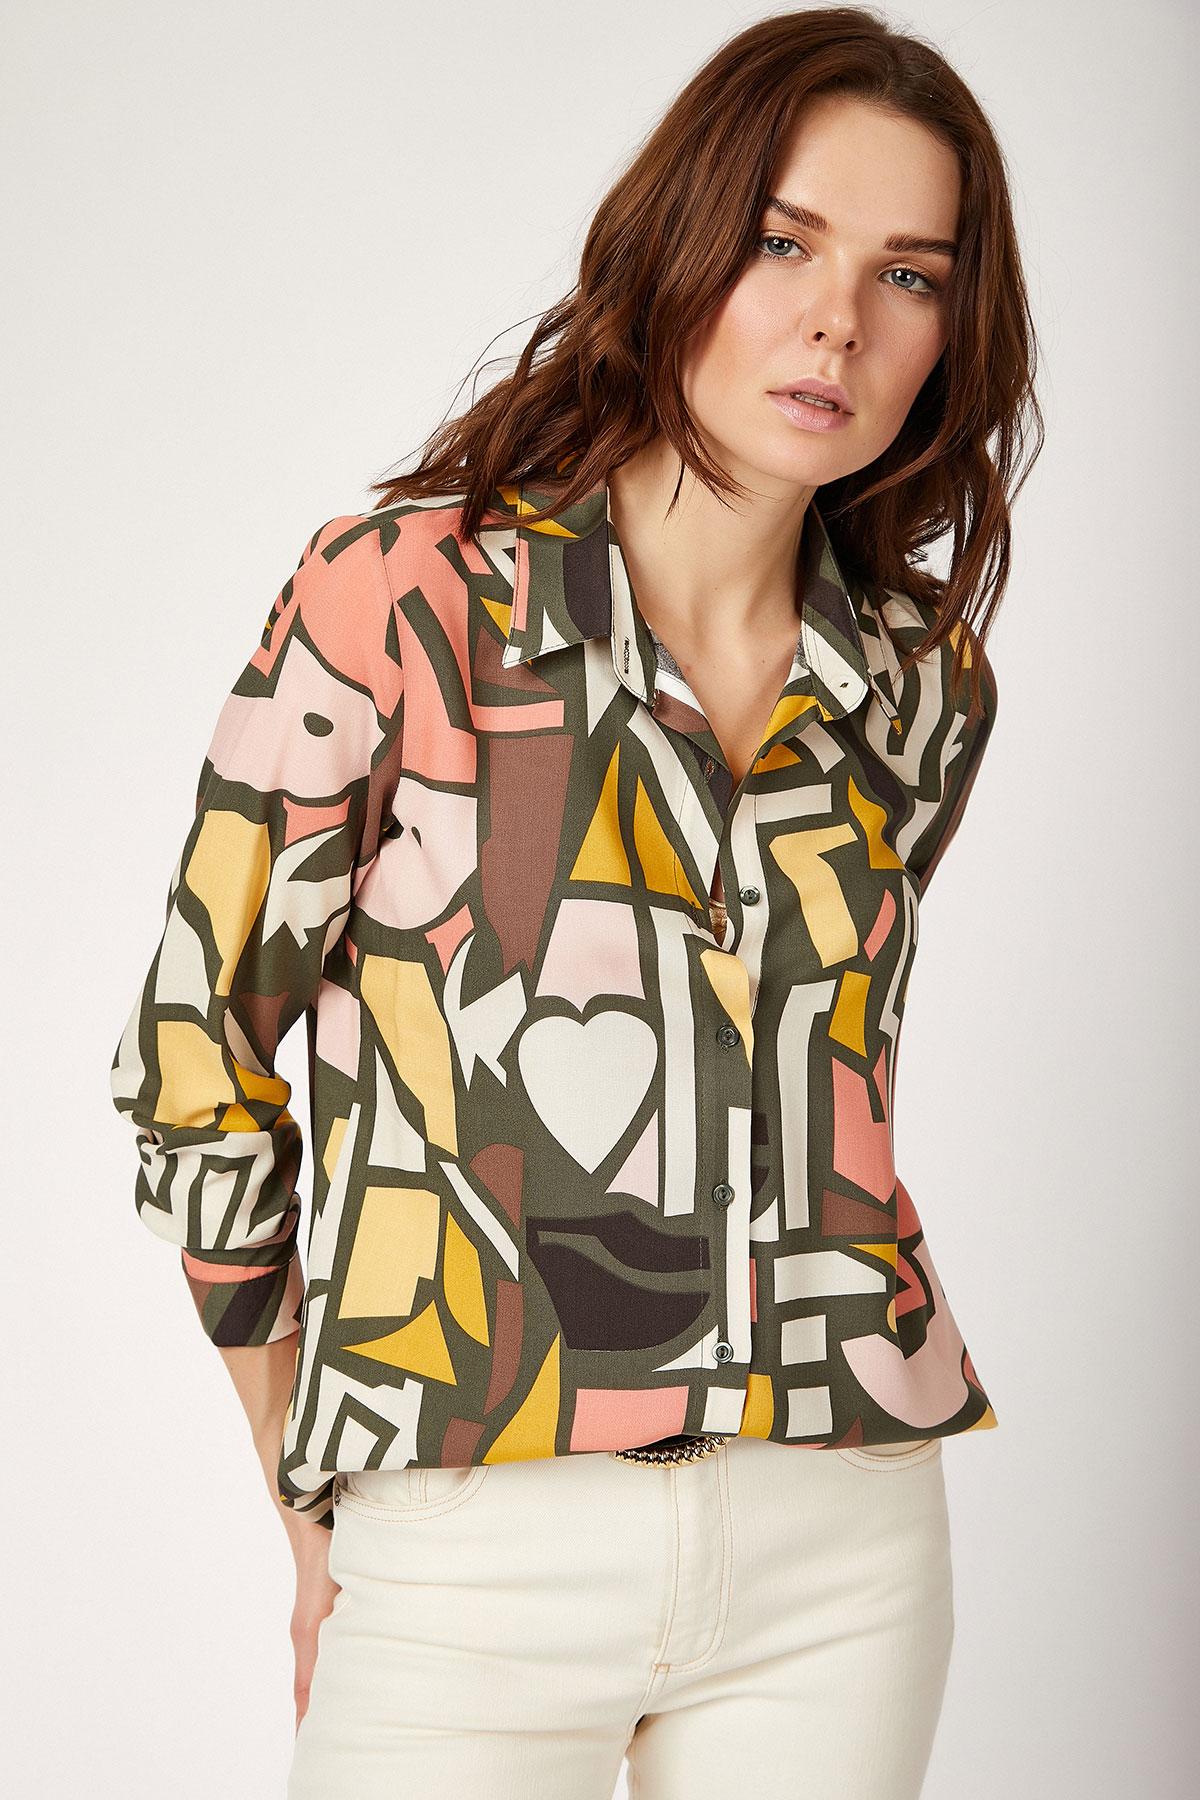 Women's Graphic Pattern Viscose Shirt